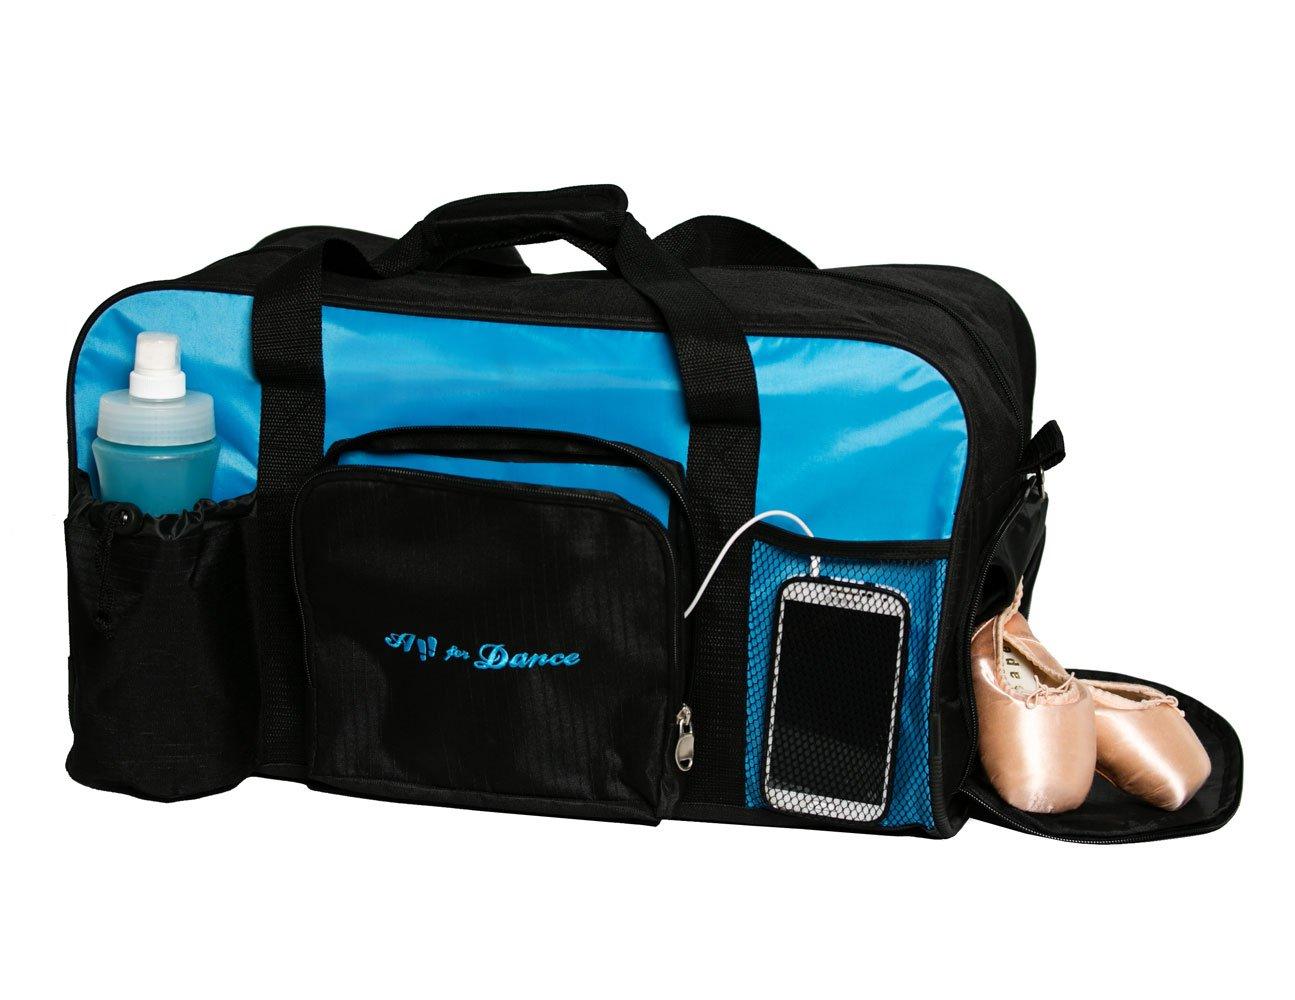 Horizon Dance 8431 All For Dance Large Duffel Bag for Dancers – Blue